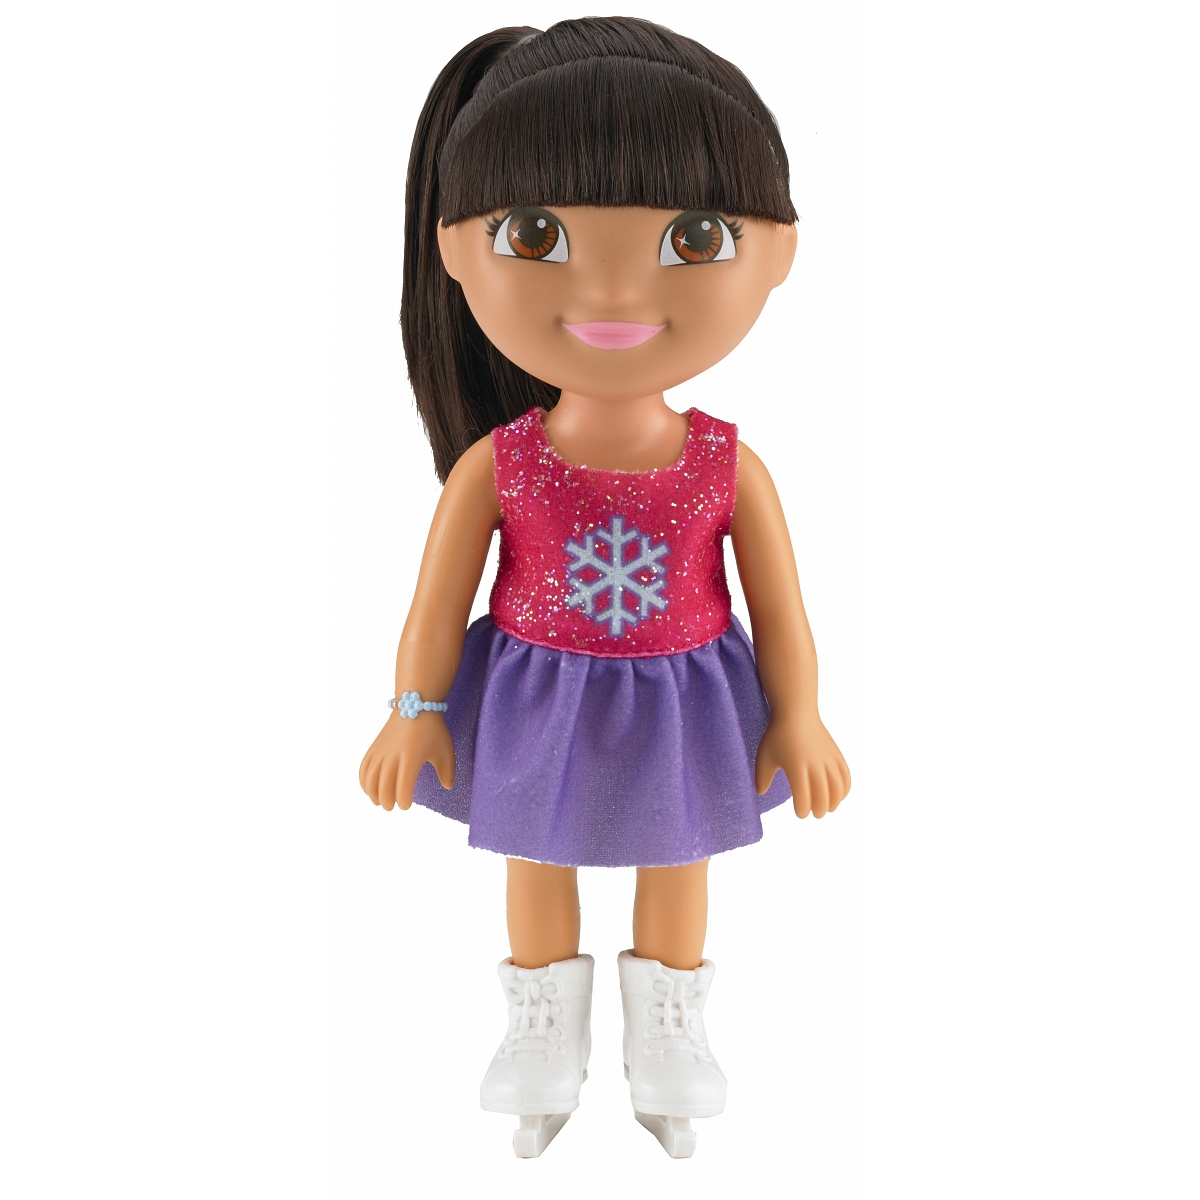 Кукла из серии Даша-путешественница - Даша на каткеКуклы и пупсы<br>Кукла из серии Даша-путешественница - Даша на катке<br>